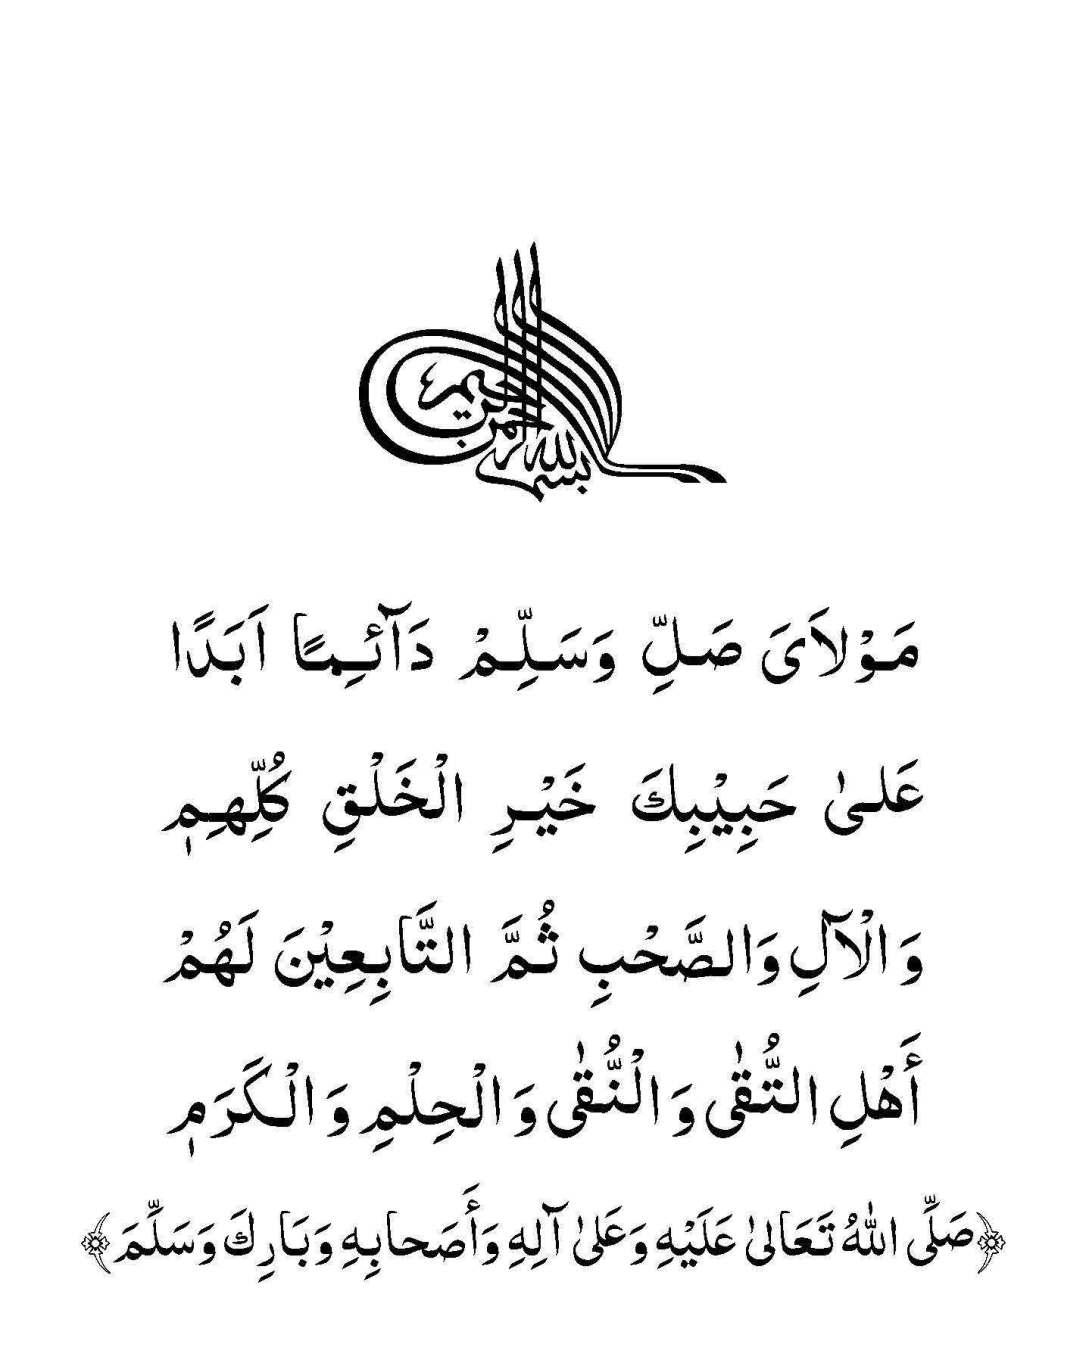 shahadate-imam-hasan-mujtaba-e28098alayh-is-salam-pdf_unlocked_Page_02